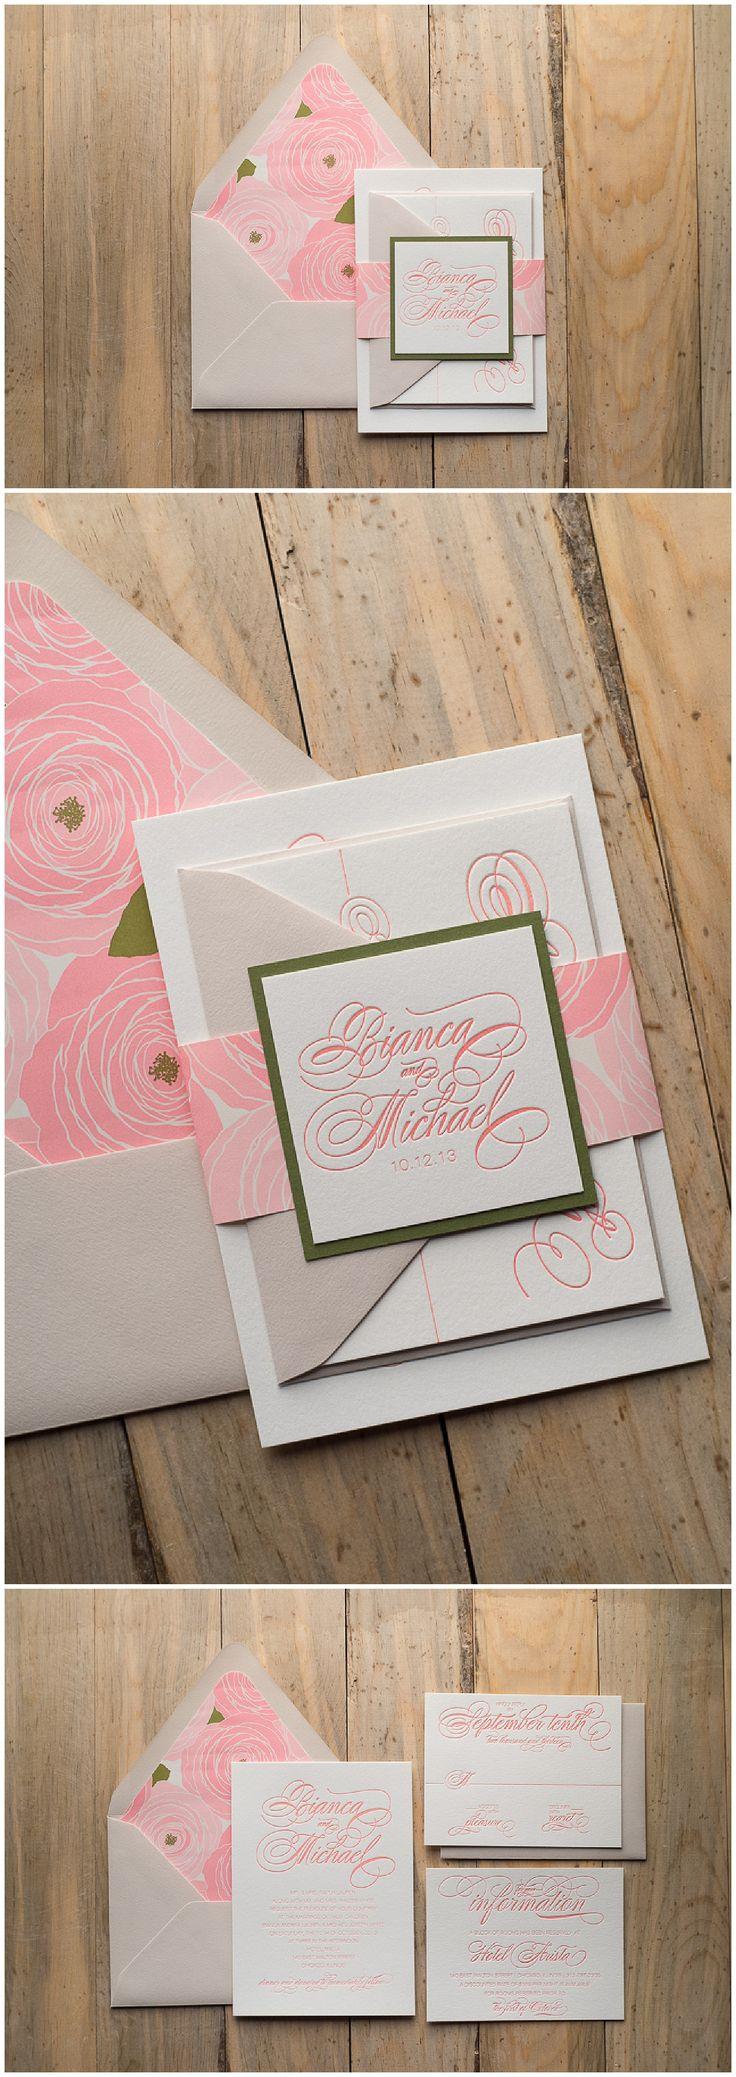 Wedding Invitations, Letterpress, Calligraphy, Blush Floral, Bianca Suite, Just Invite Me